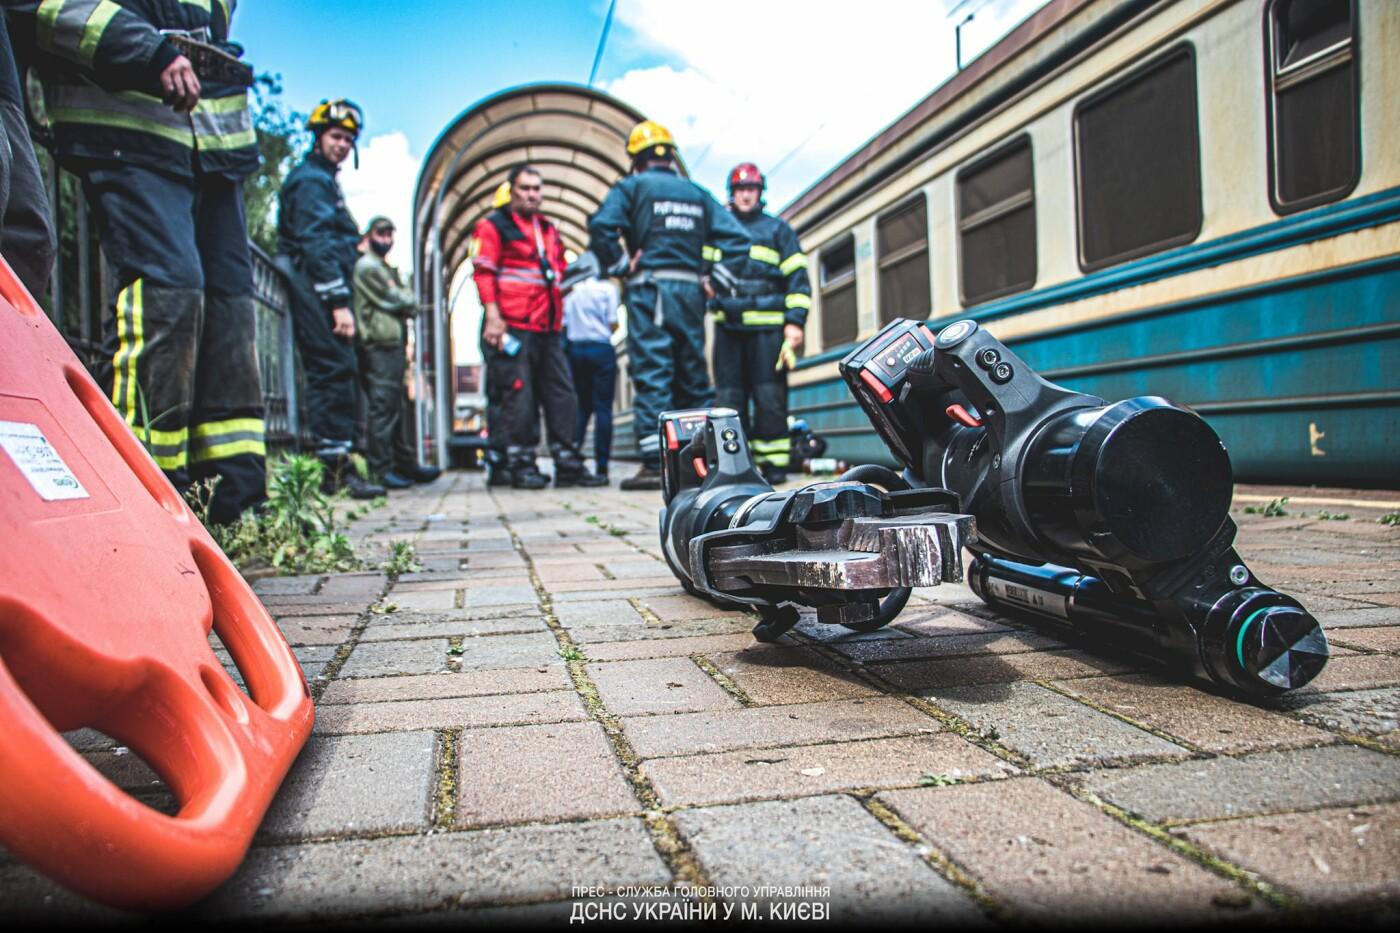 на станции Караваевы Дачи погиб мужчина